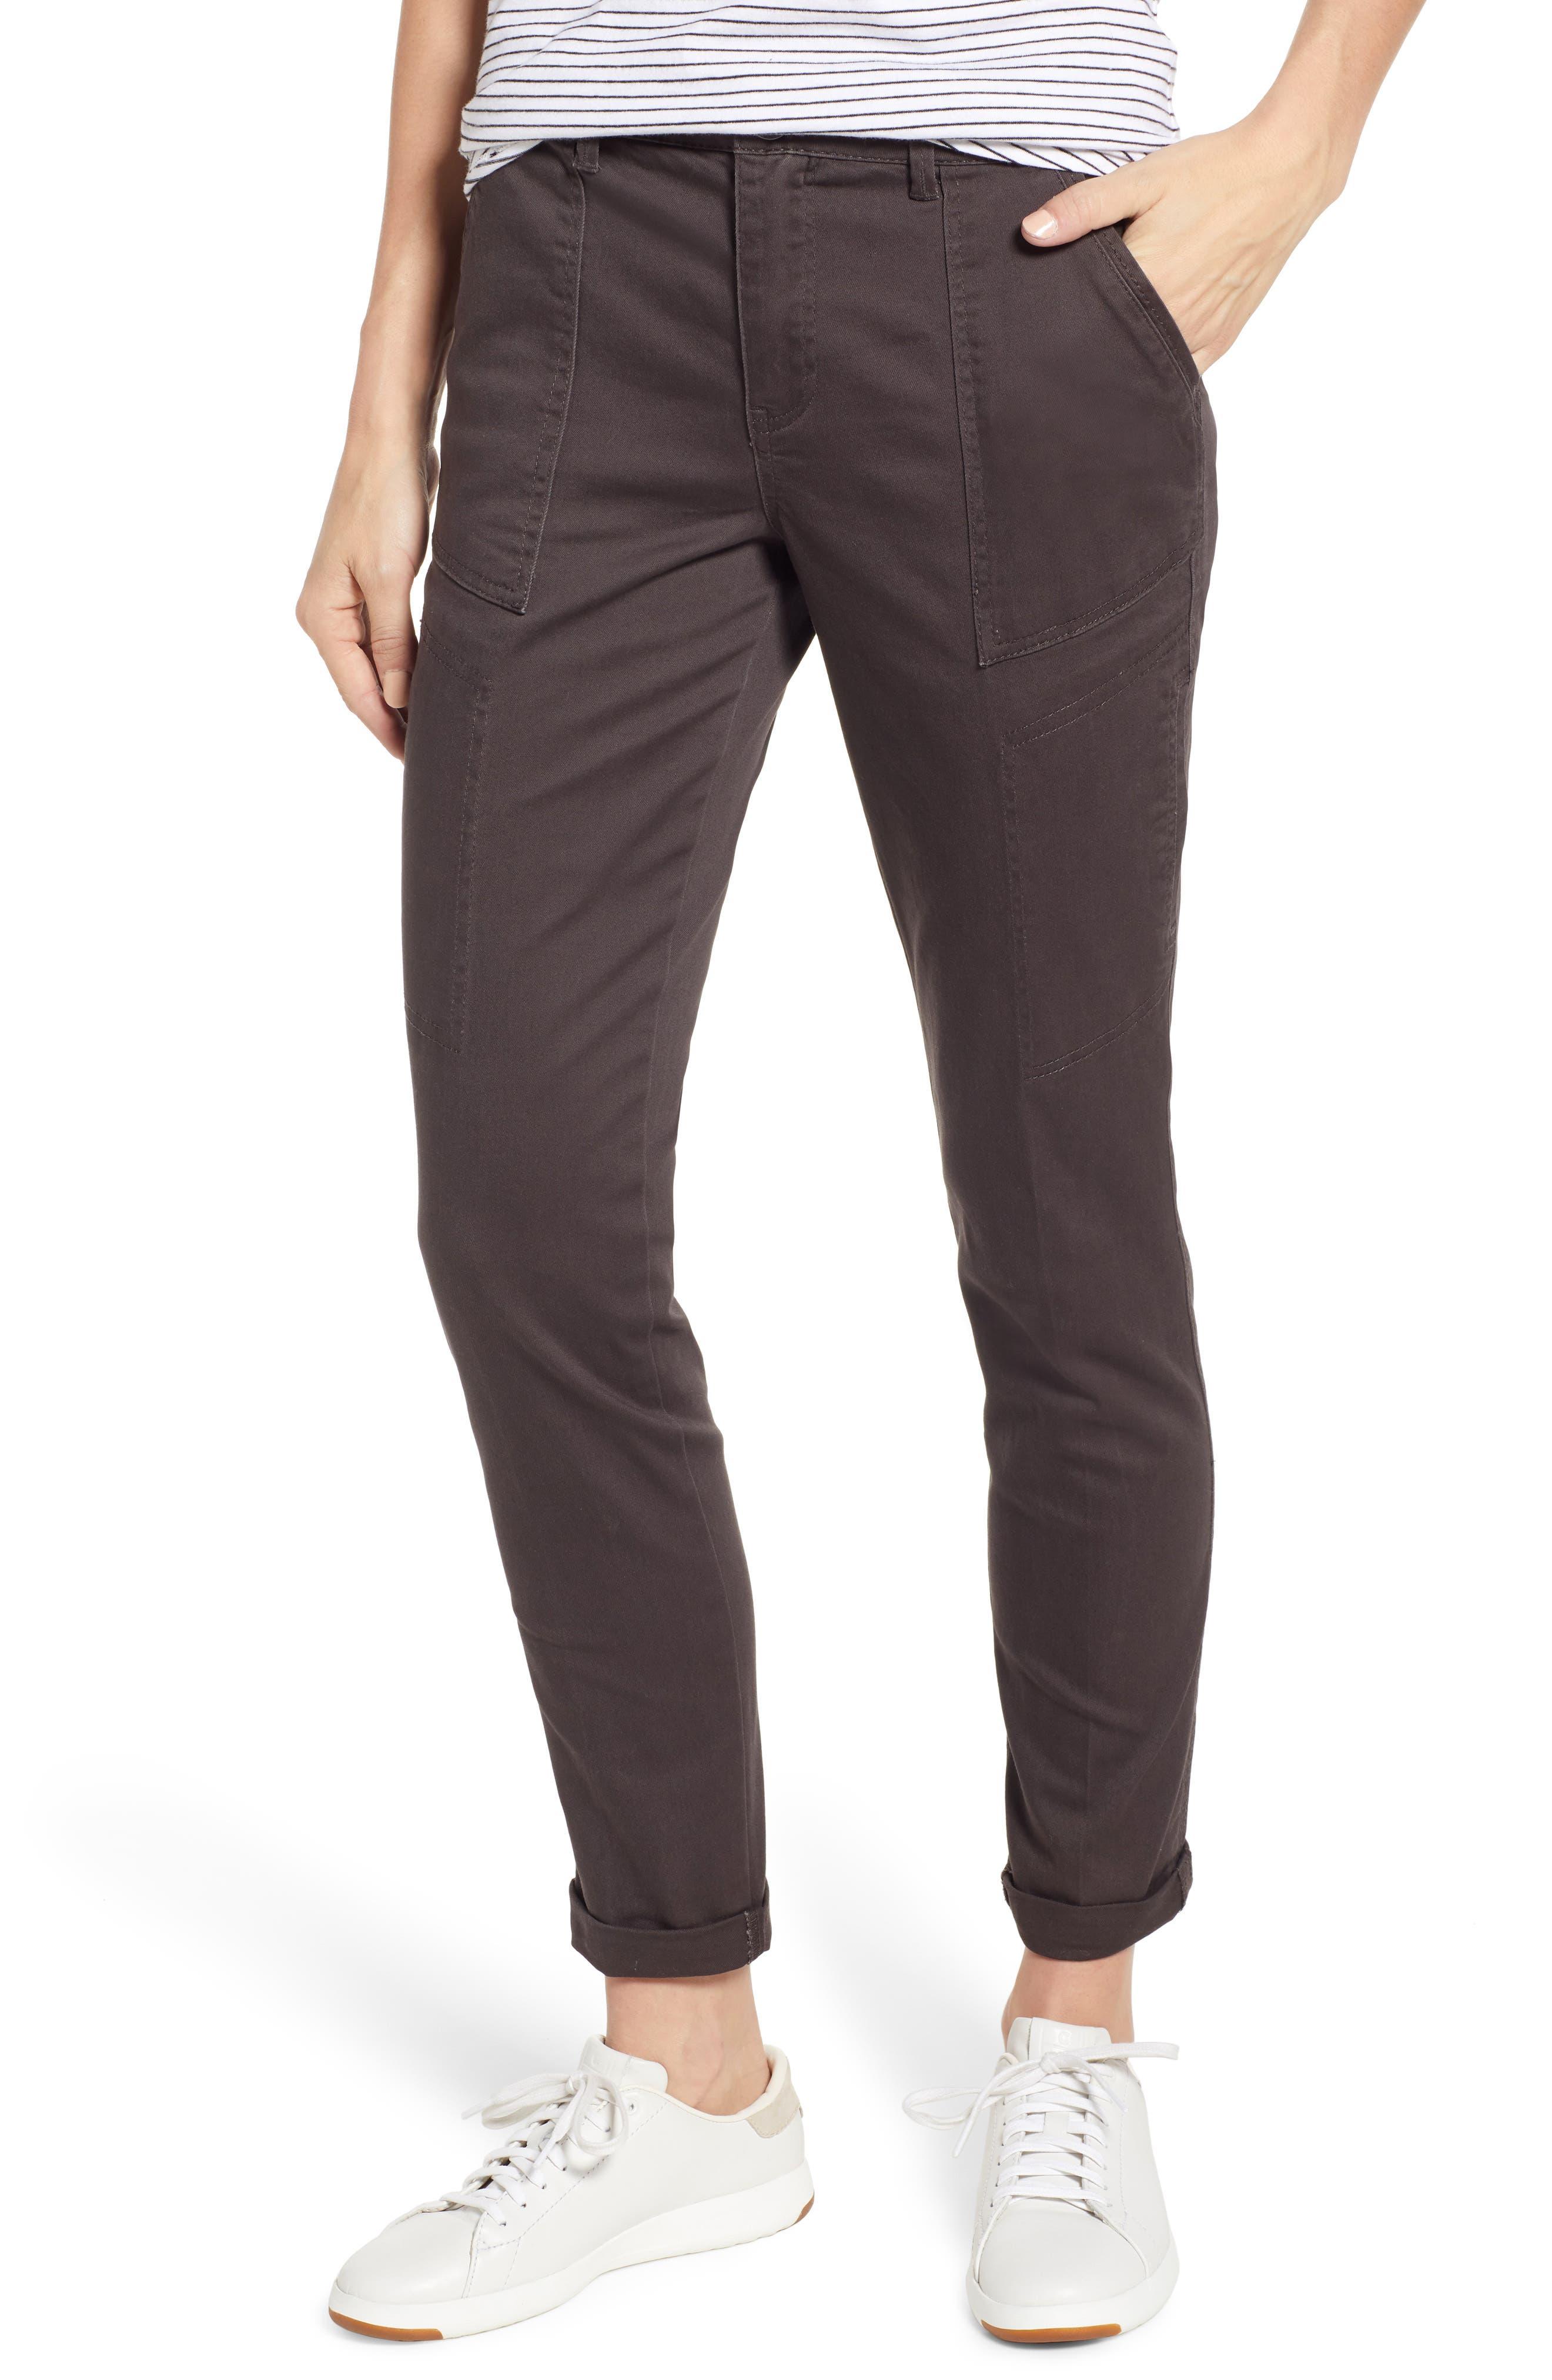 Wit & Wisdom Flex-Ellent High Waist Cargo Pants, Brown